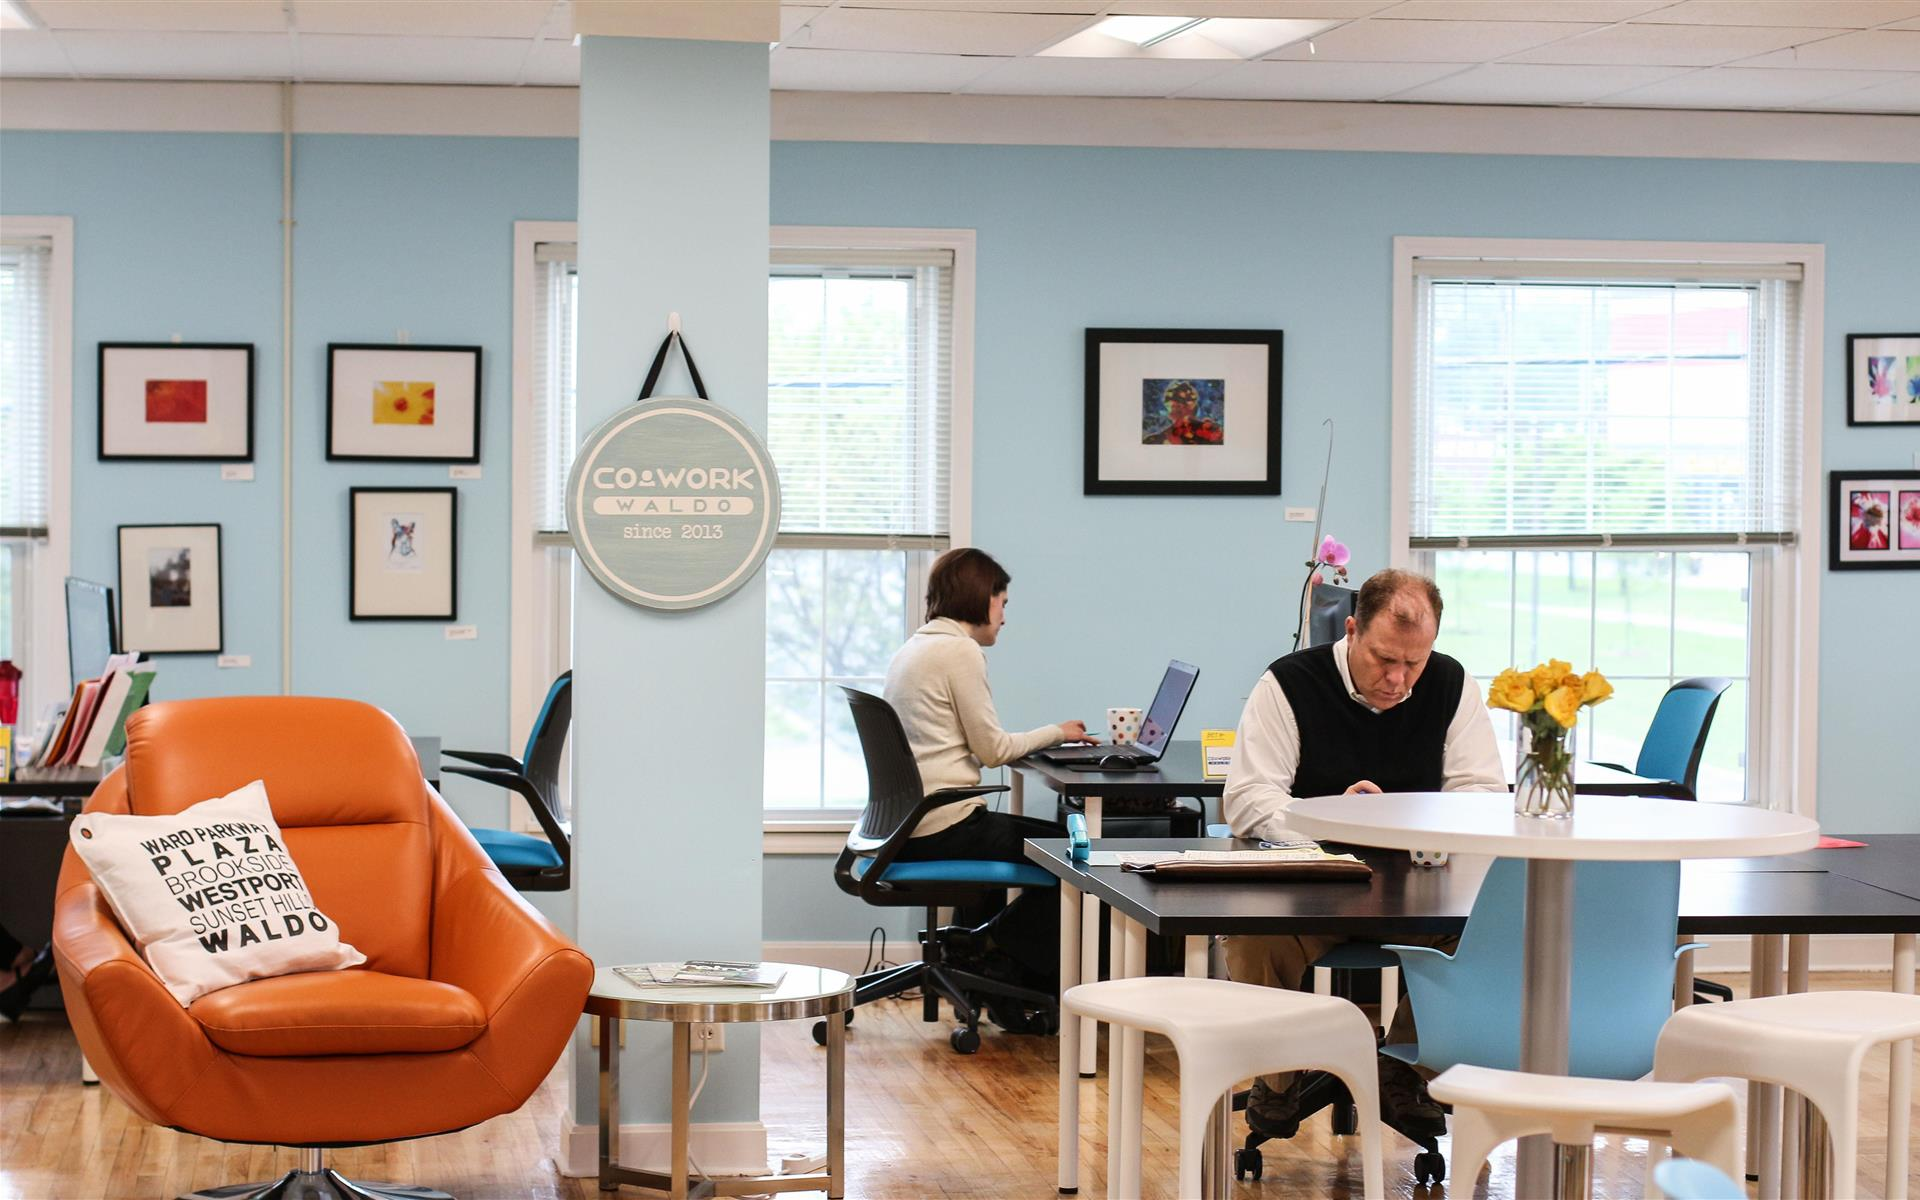 Cowork Waldo - Flex Desk Part-Time